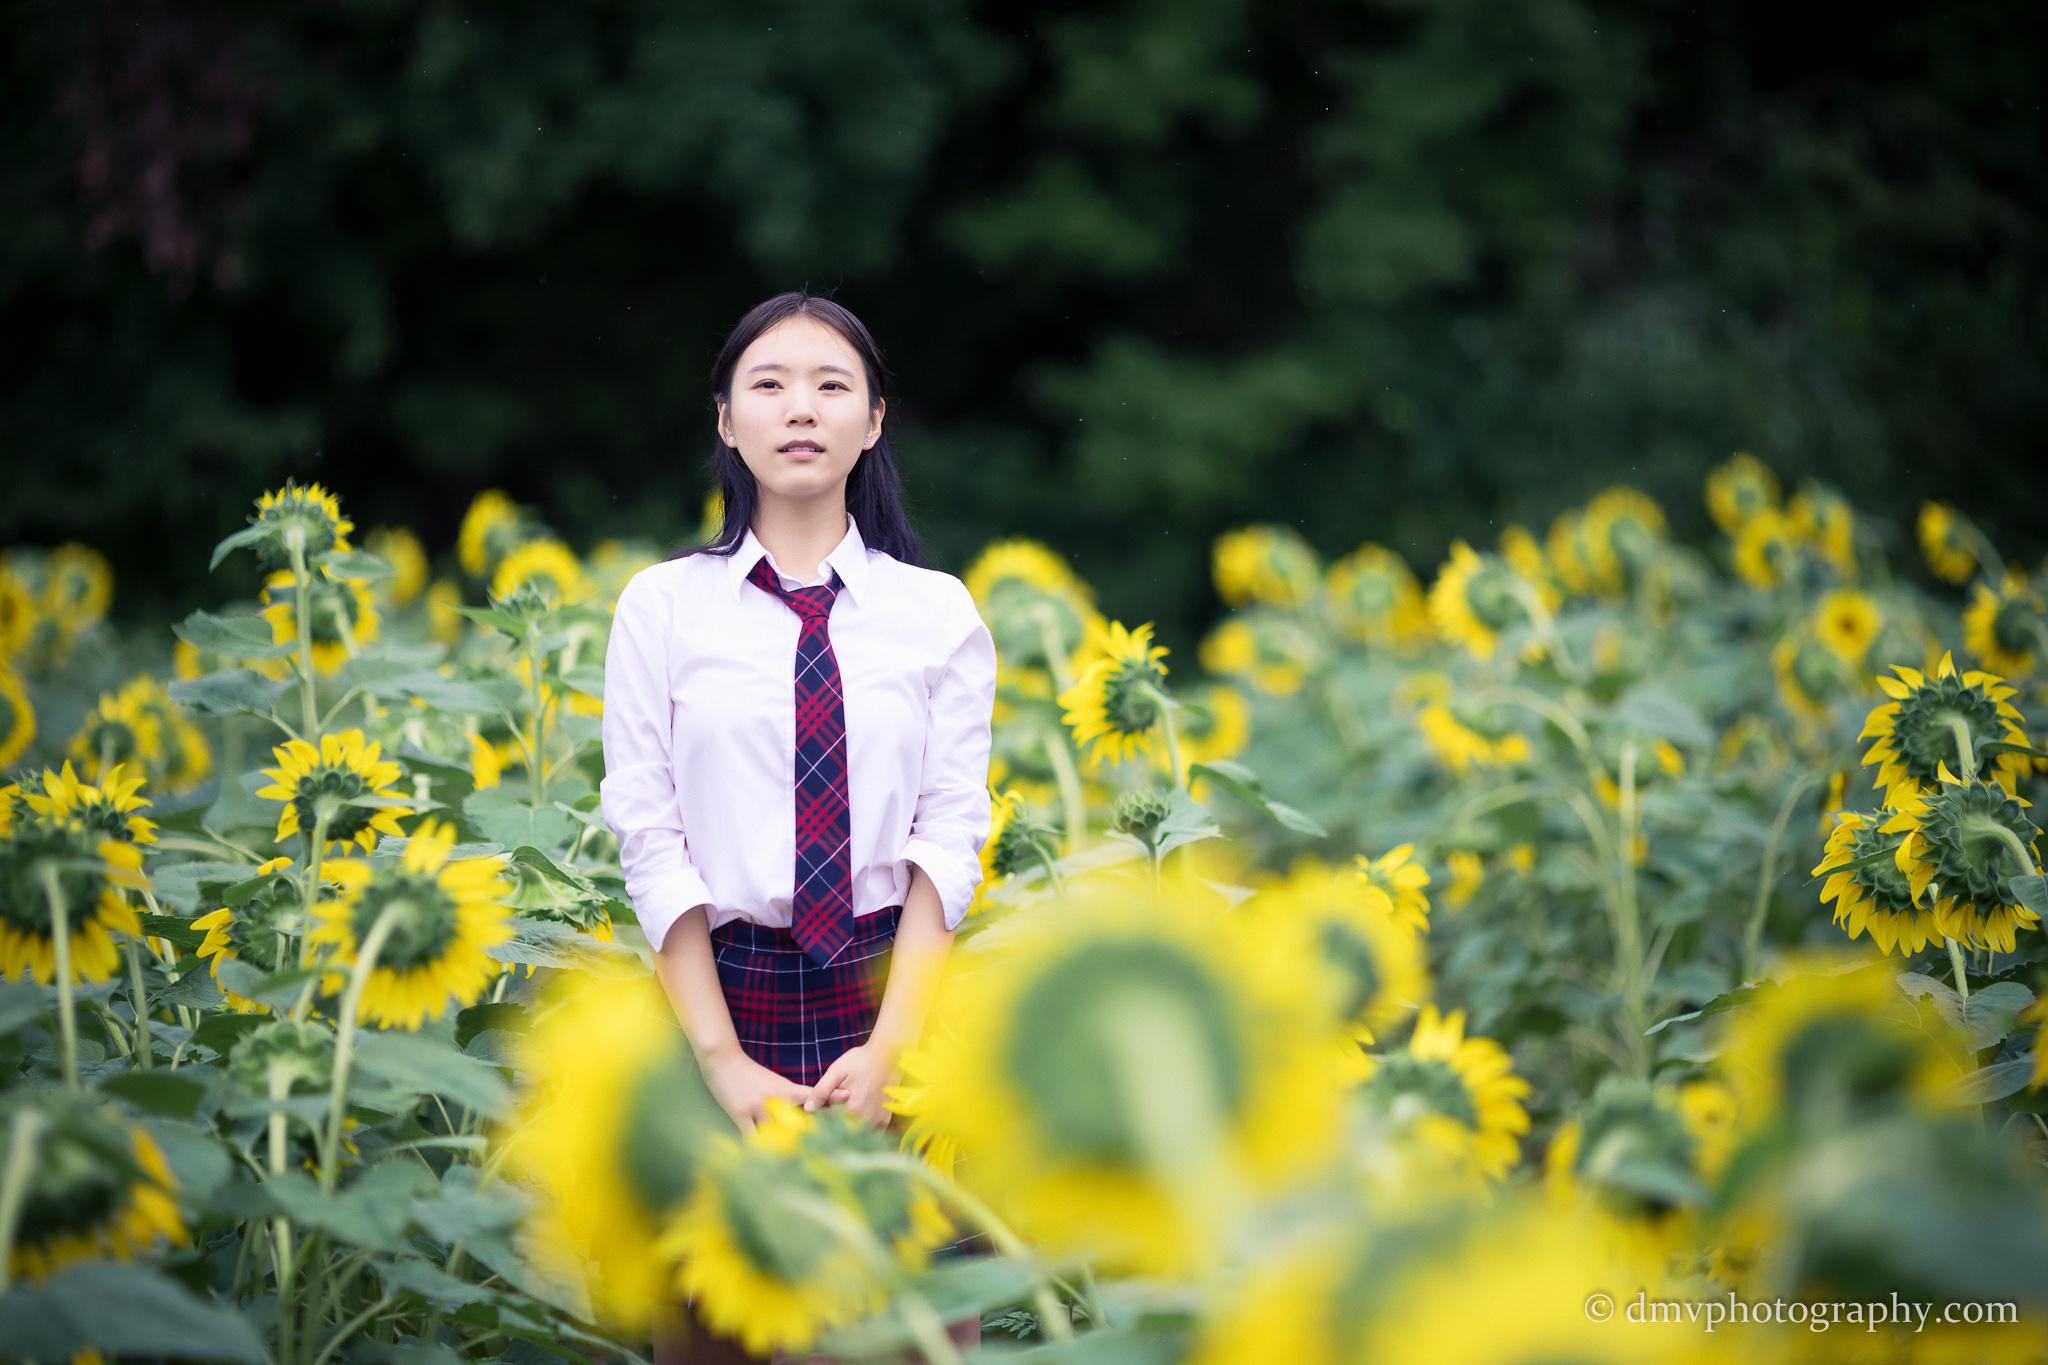 2017-07-29 - Yu Jie Sunflower - 00032